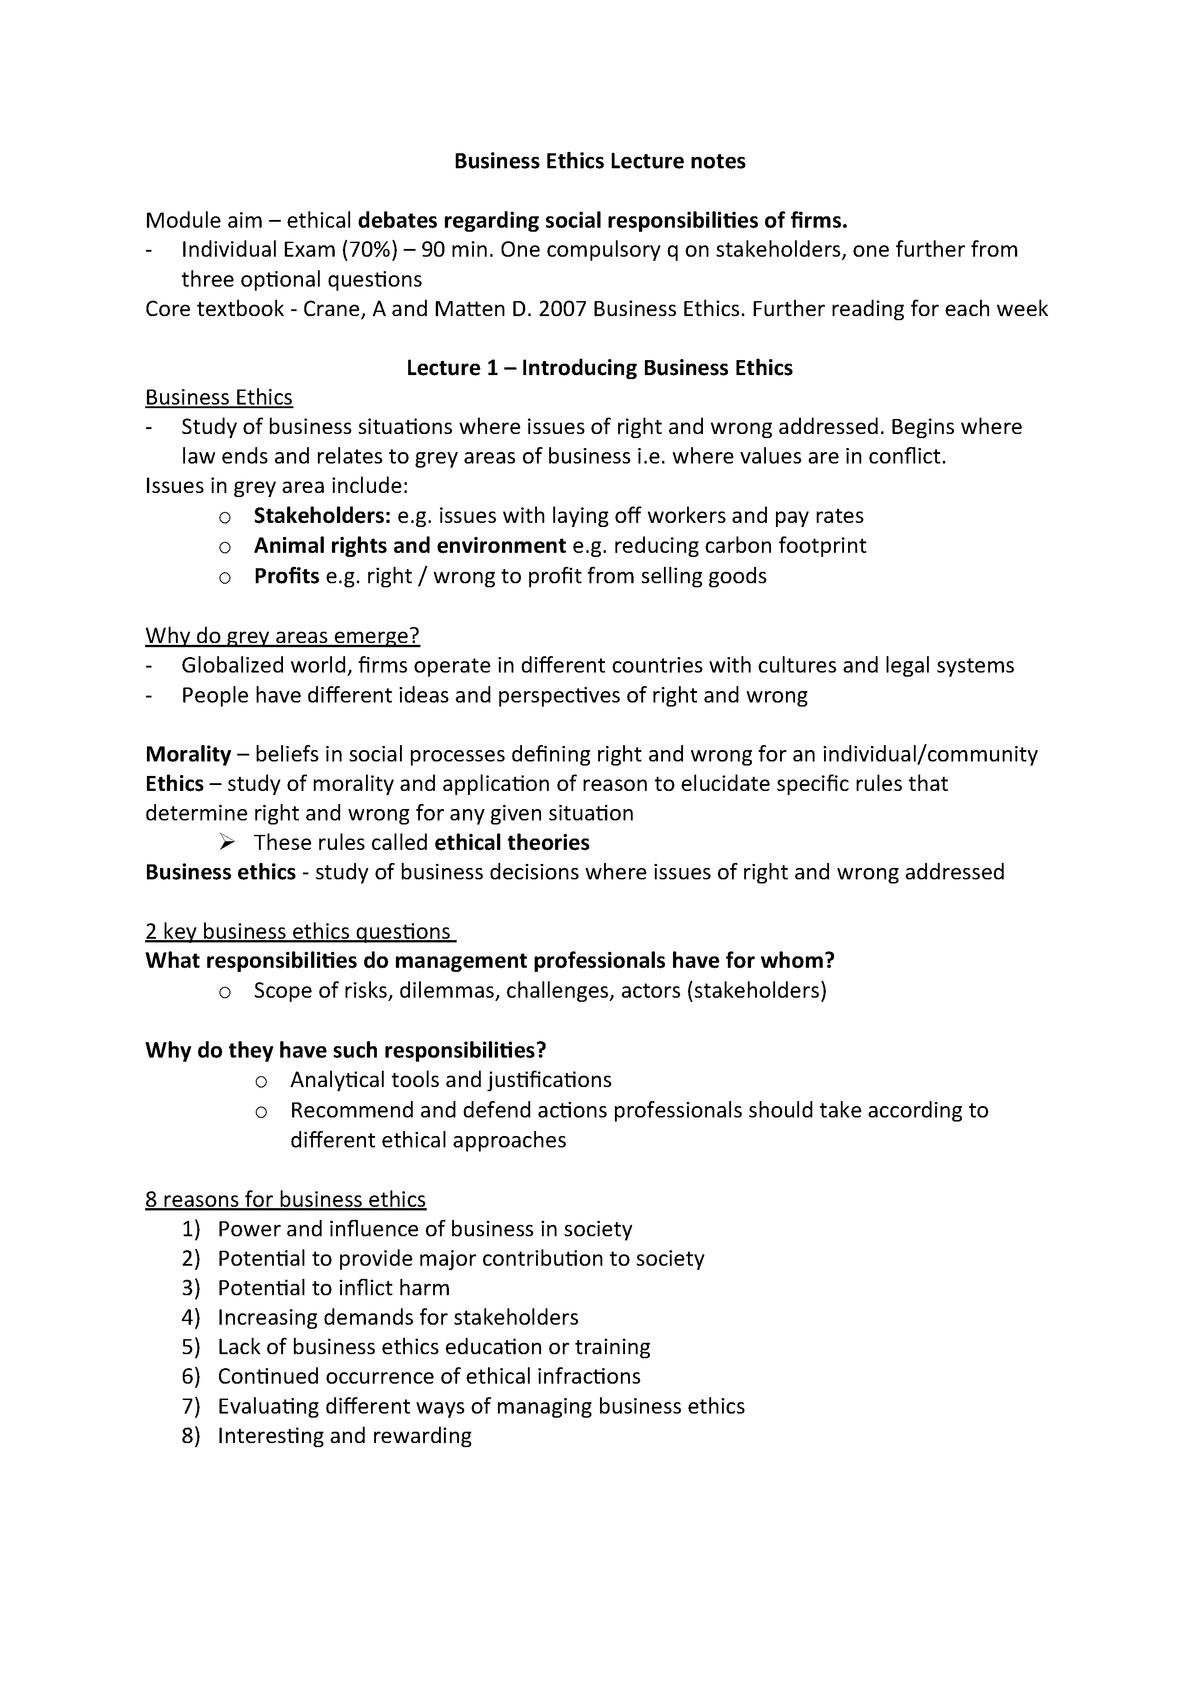 Business Ethics Lecture notes - Business Ethics - StuDocu